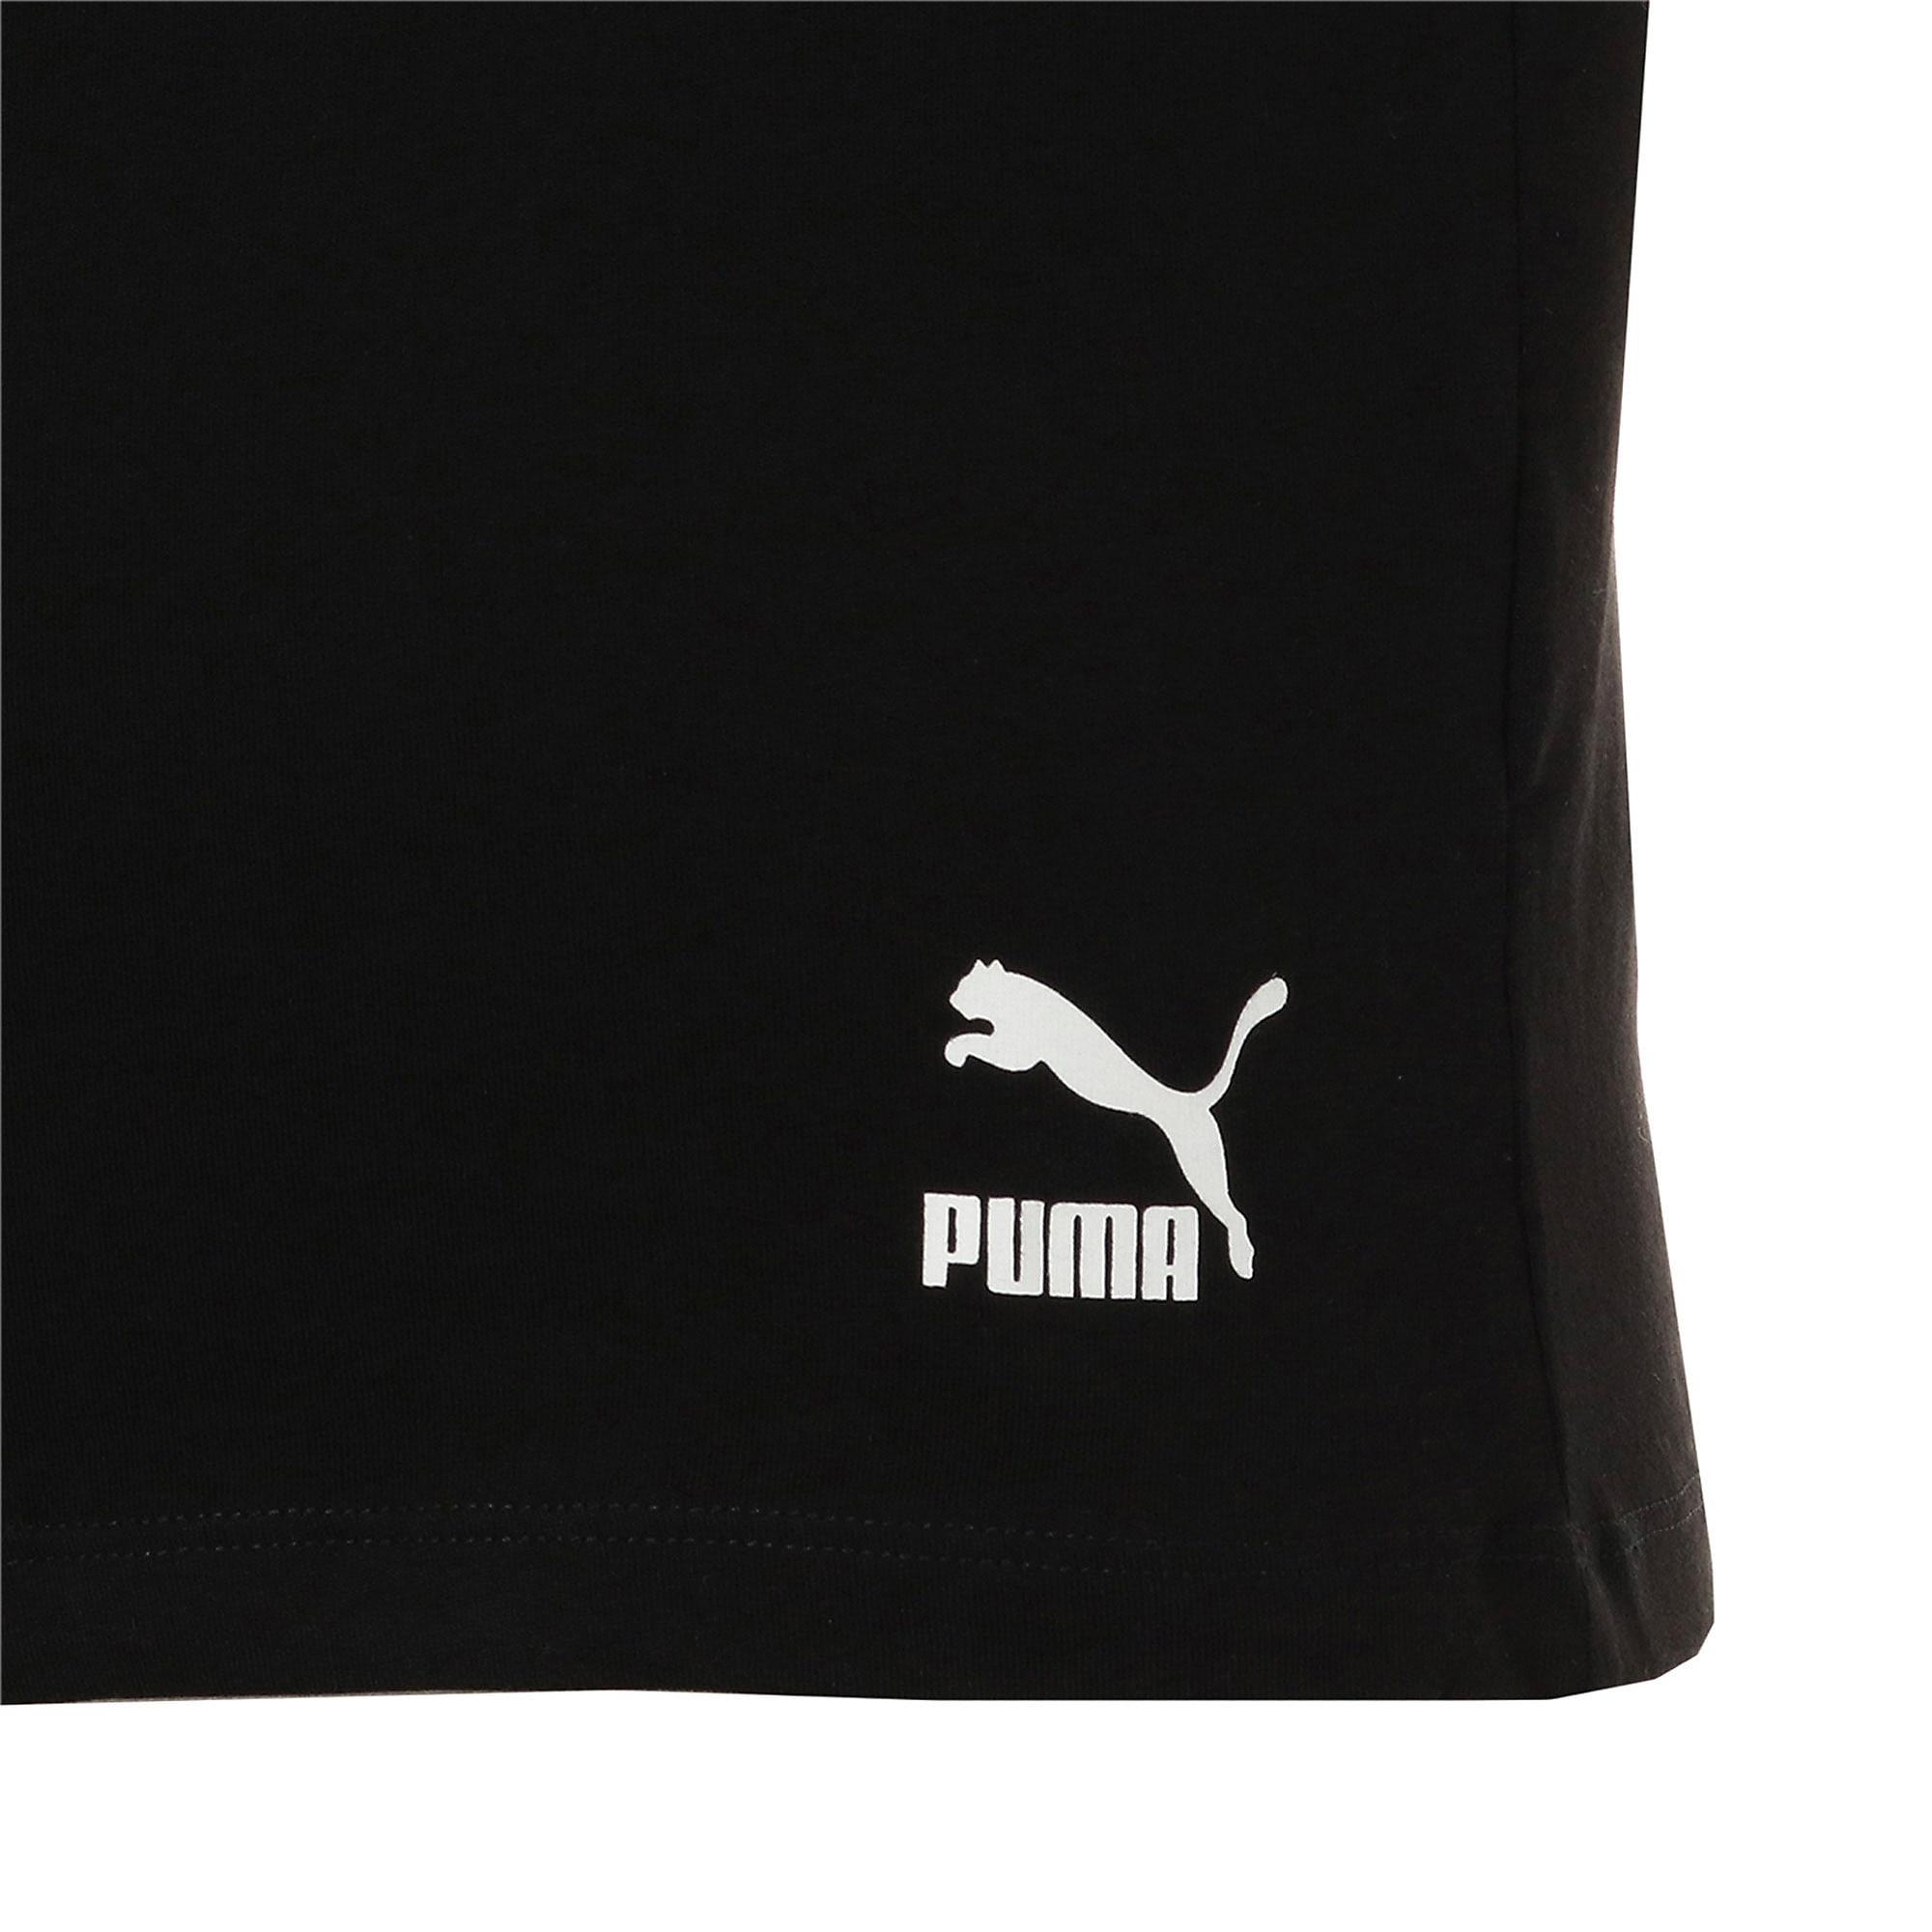 Thumbnail 8 of プーマ XTG ウィメンズ CB SS Tシャツ 半袖, Puma Black, medium-JPN